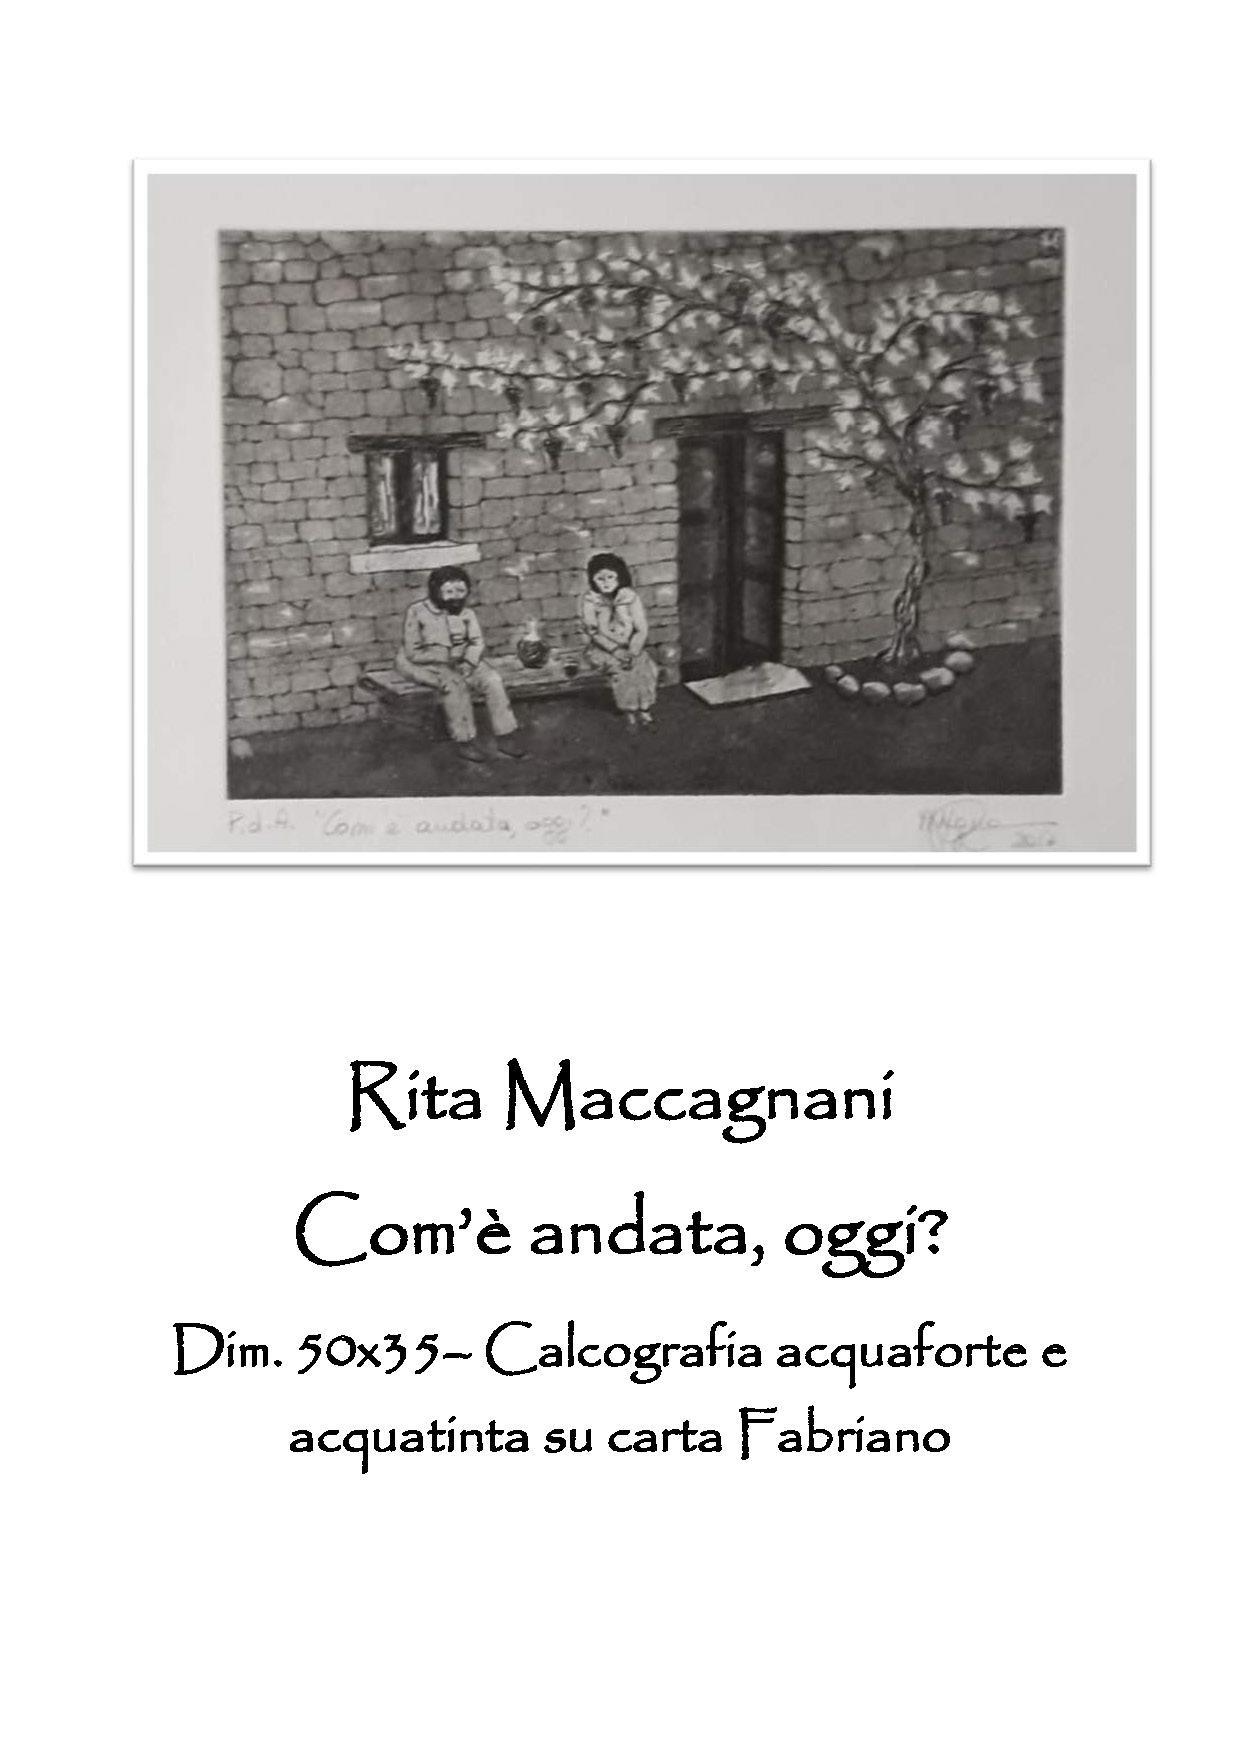 http://www.proartpiagge.it/wp-content/uploads/2020/04/Maccagnani.jpg